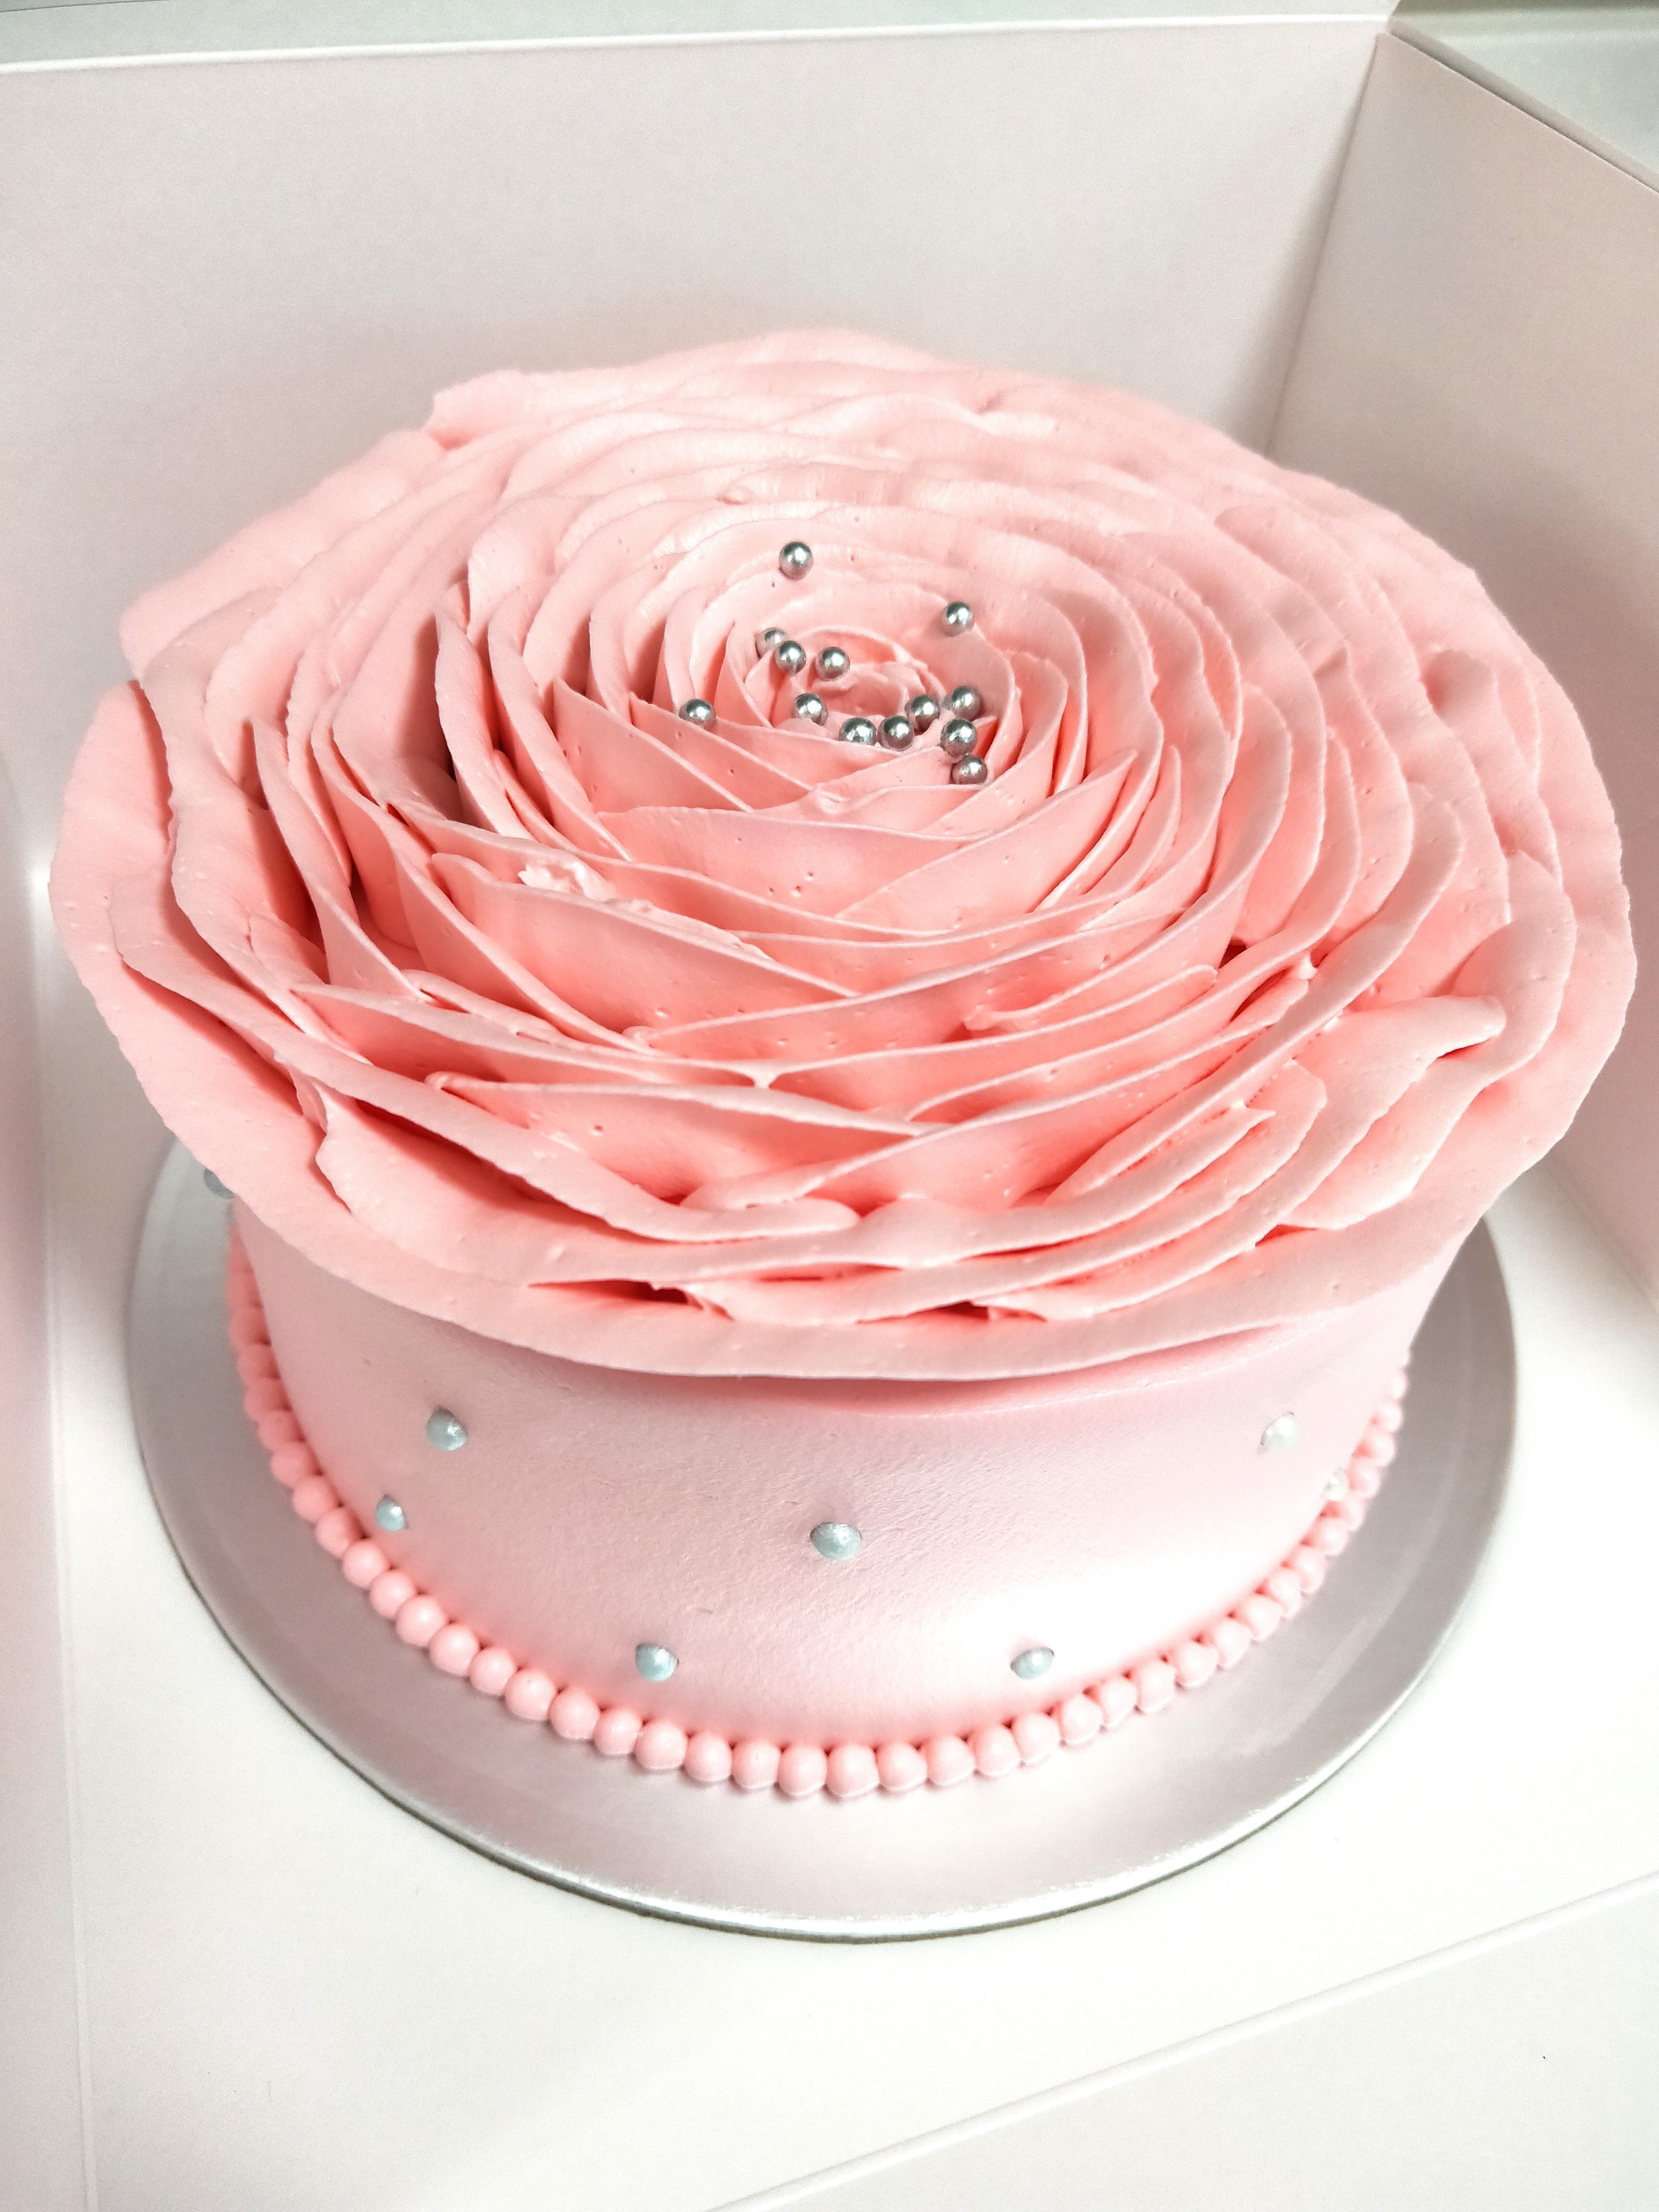 Offer Rose Petal Birthday Cake Food Drinks Baked Goods On Carousell